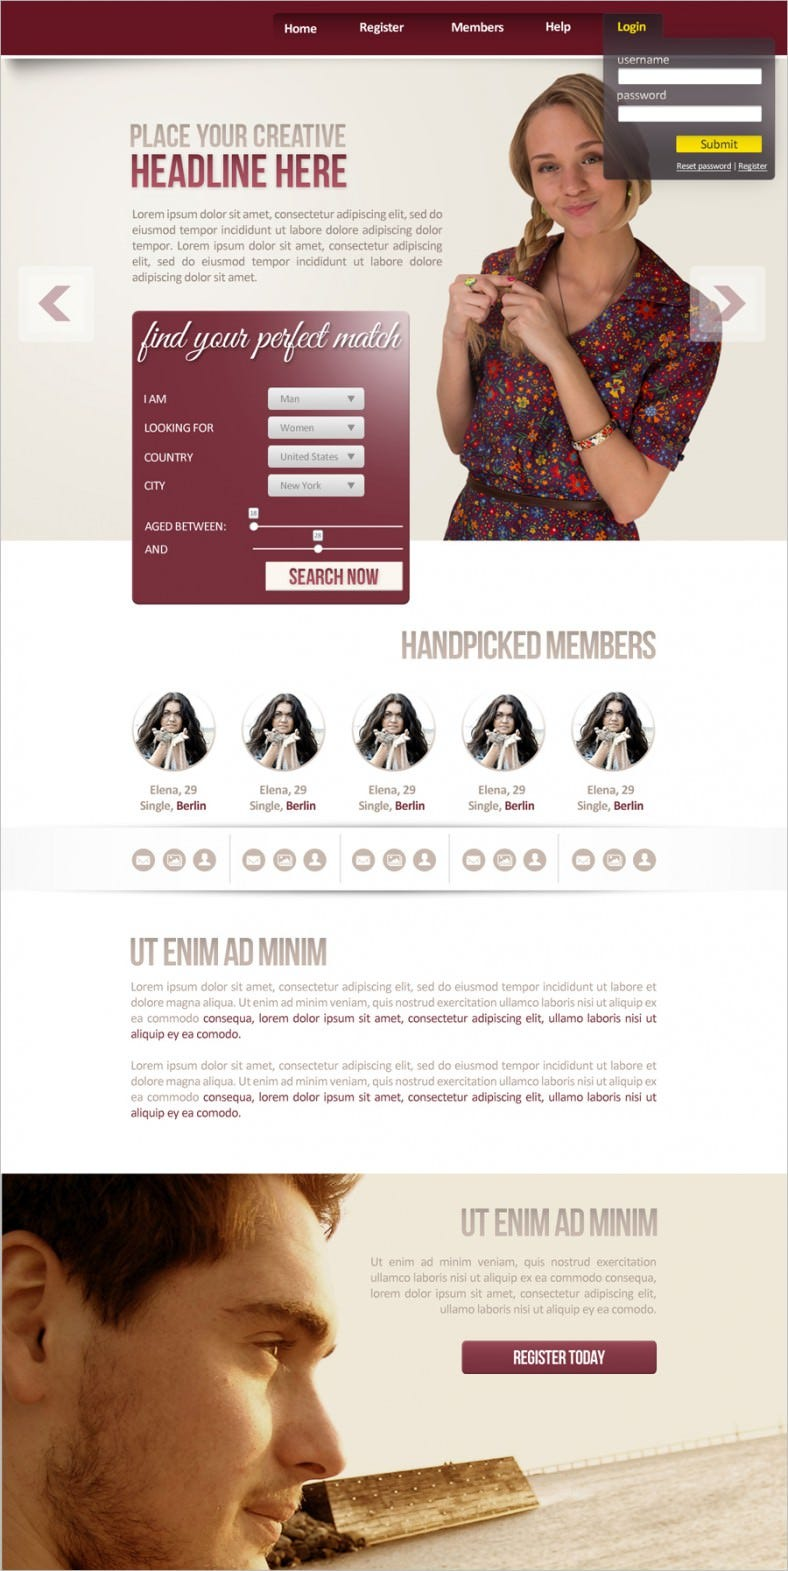 Speed dating website template - QUIETLYWEIGHT.GQ